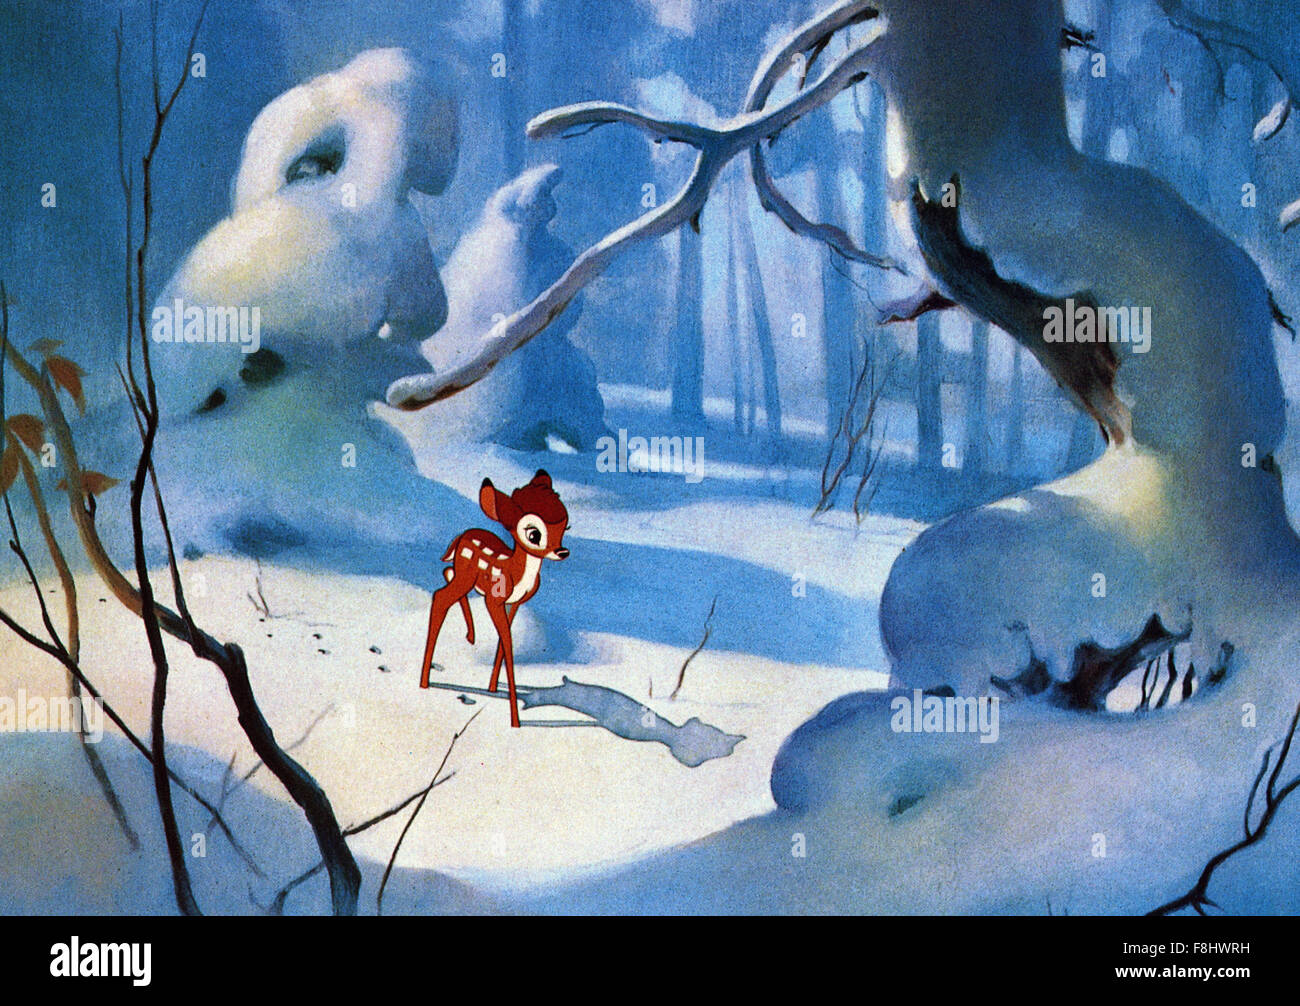 Bambi walt disney pictures 1942 direttore david d. mano foto